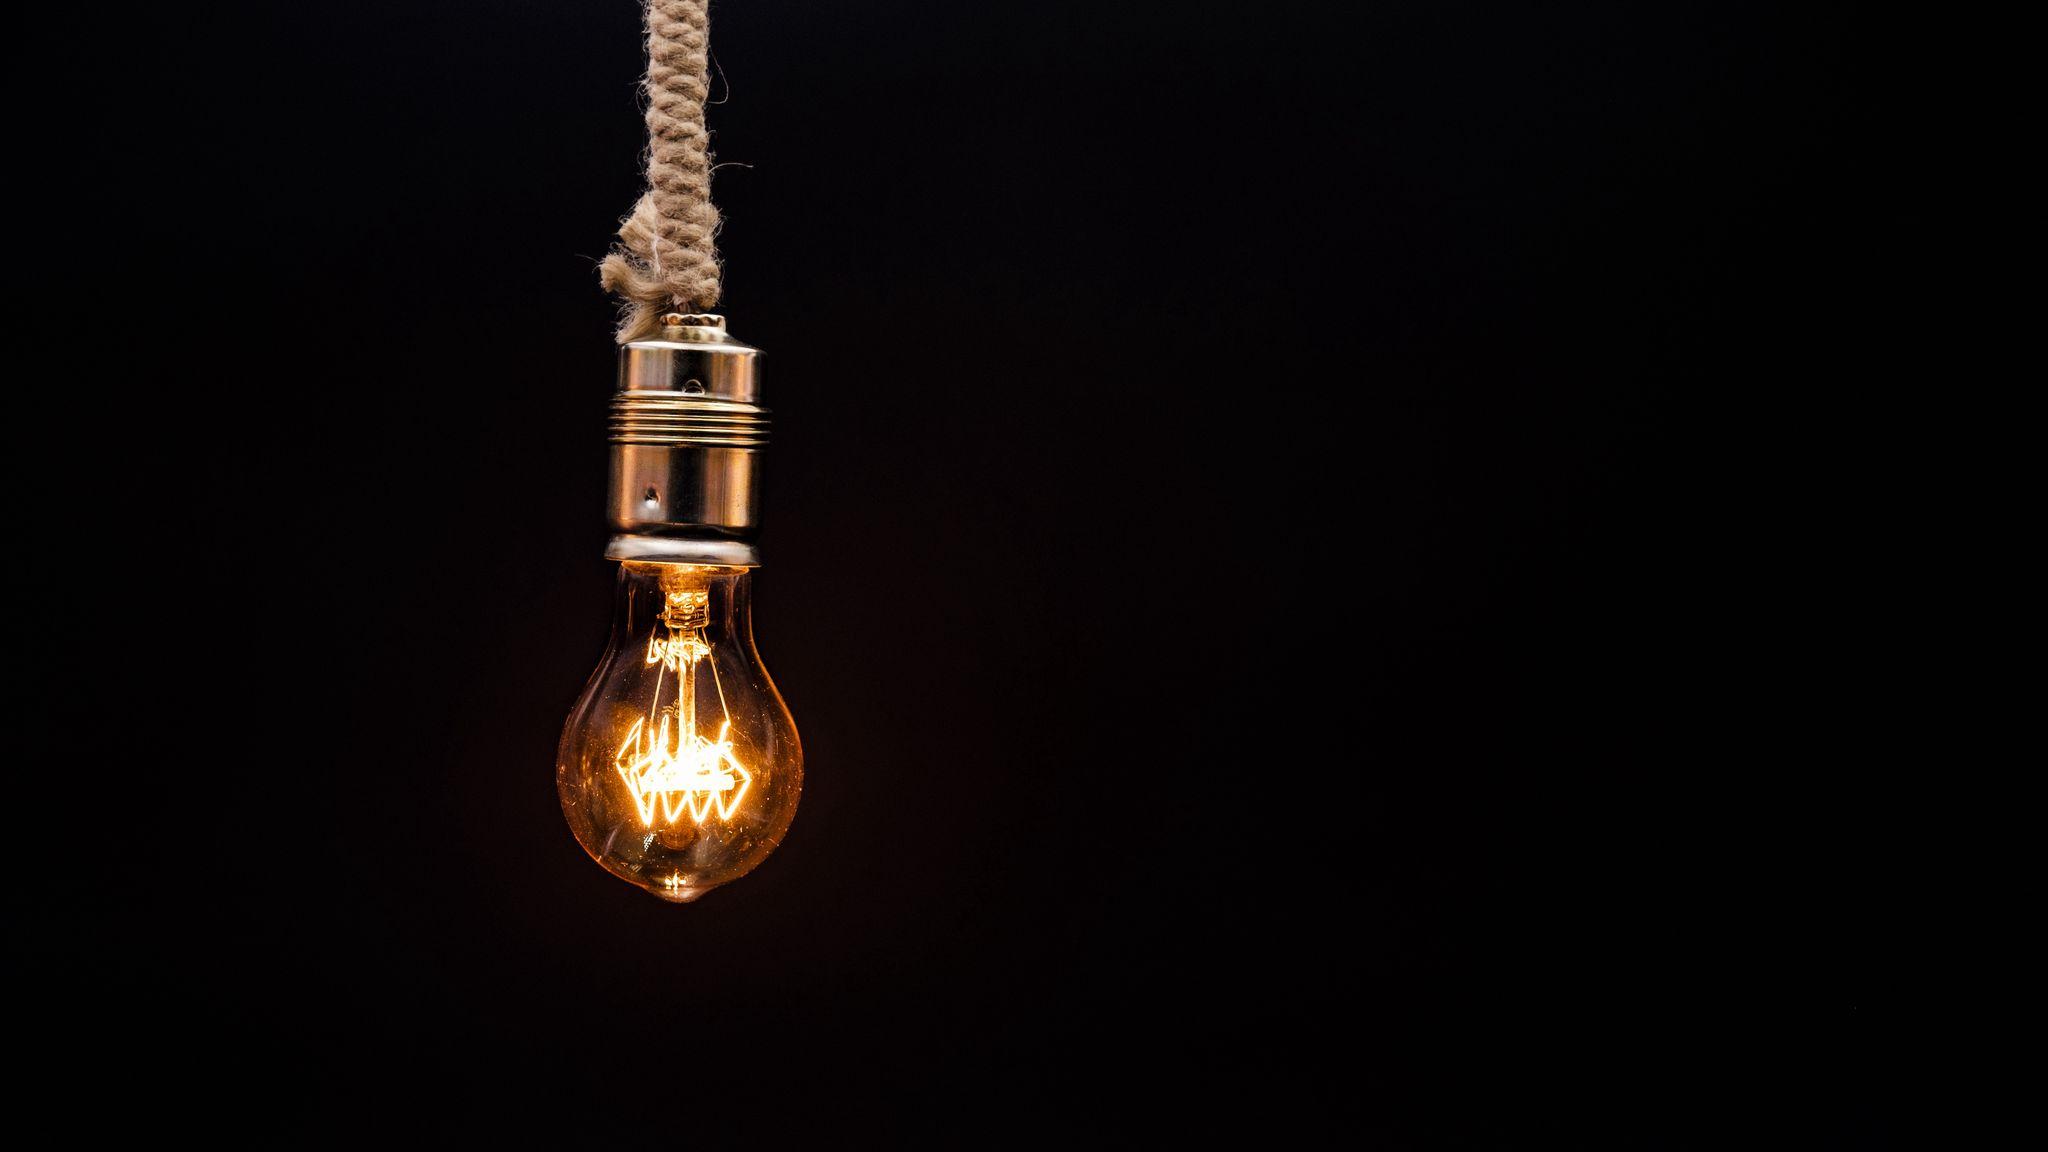 2048x1152 Wallpaper bulb, lighting, rope, electricity, edisons lamp